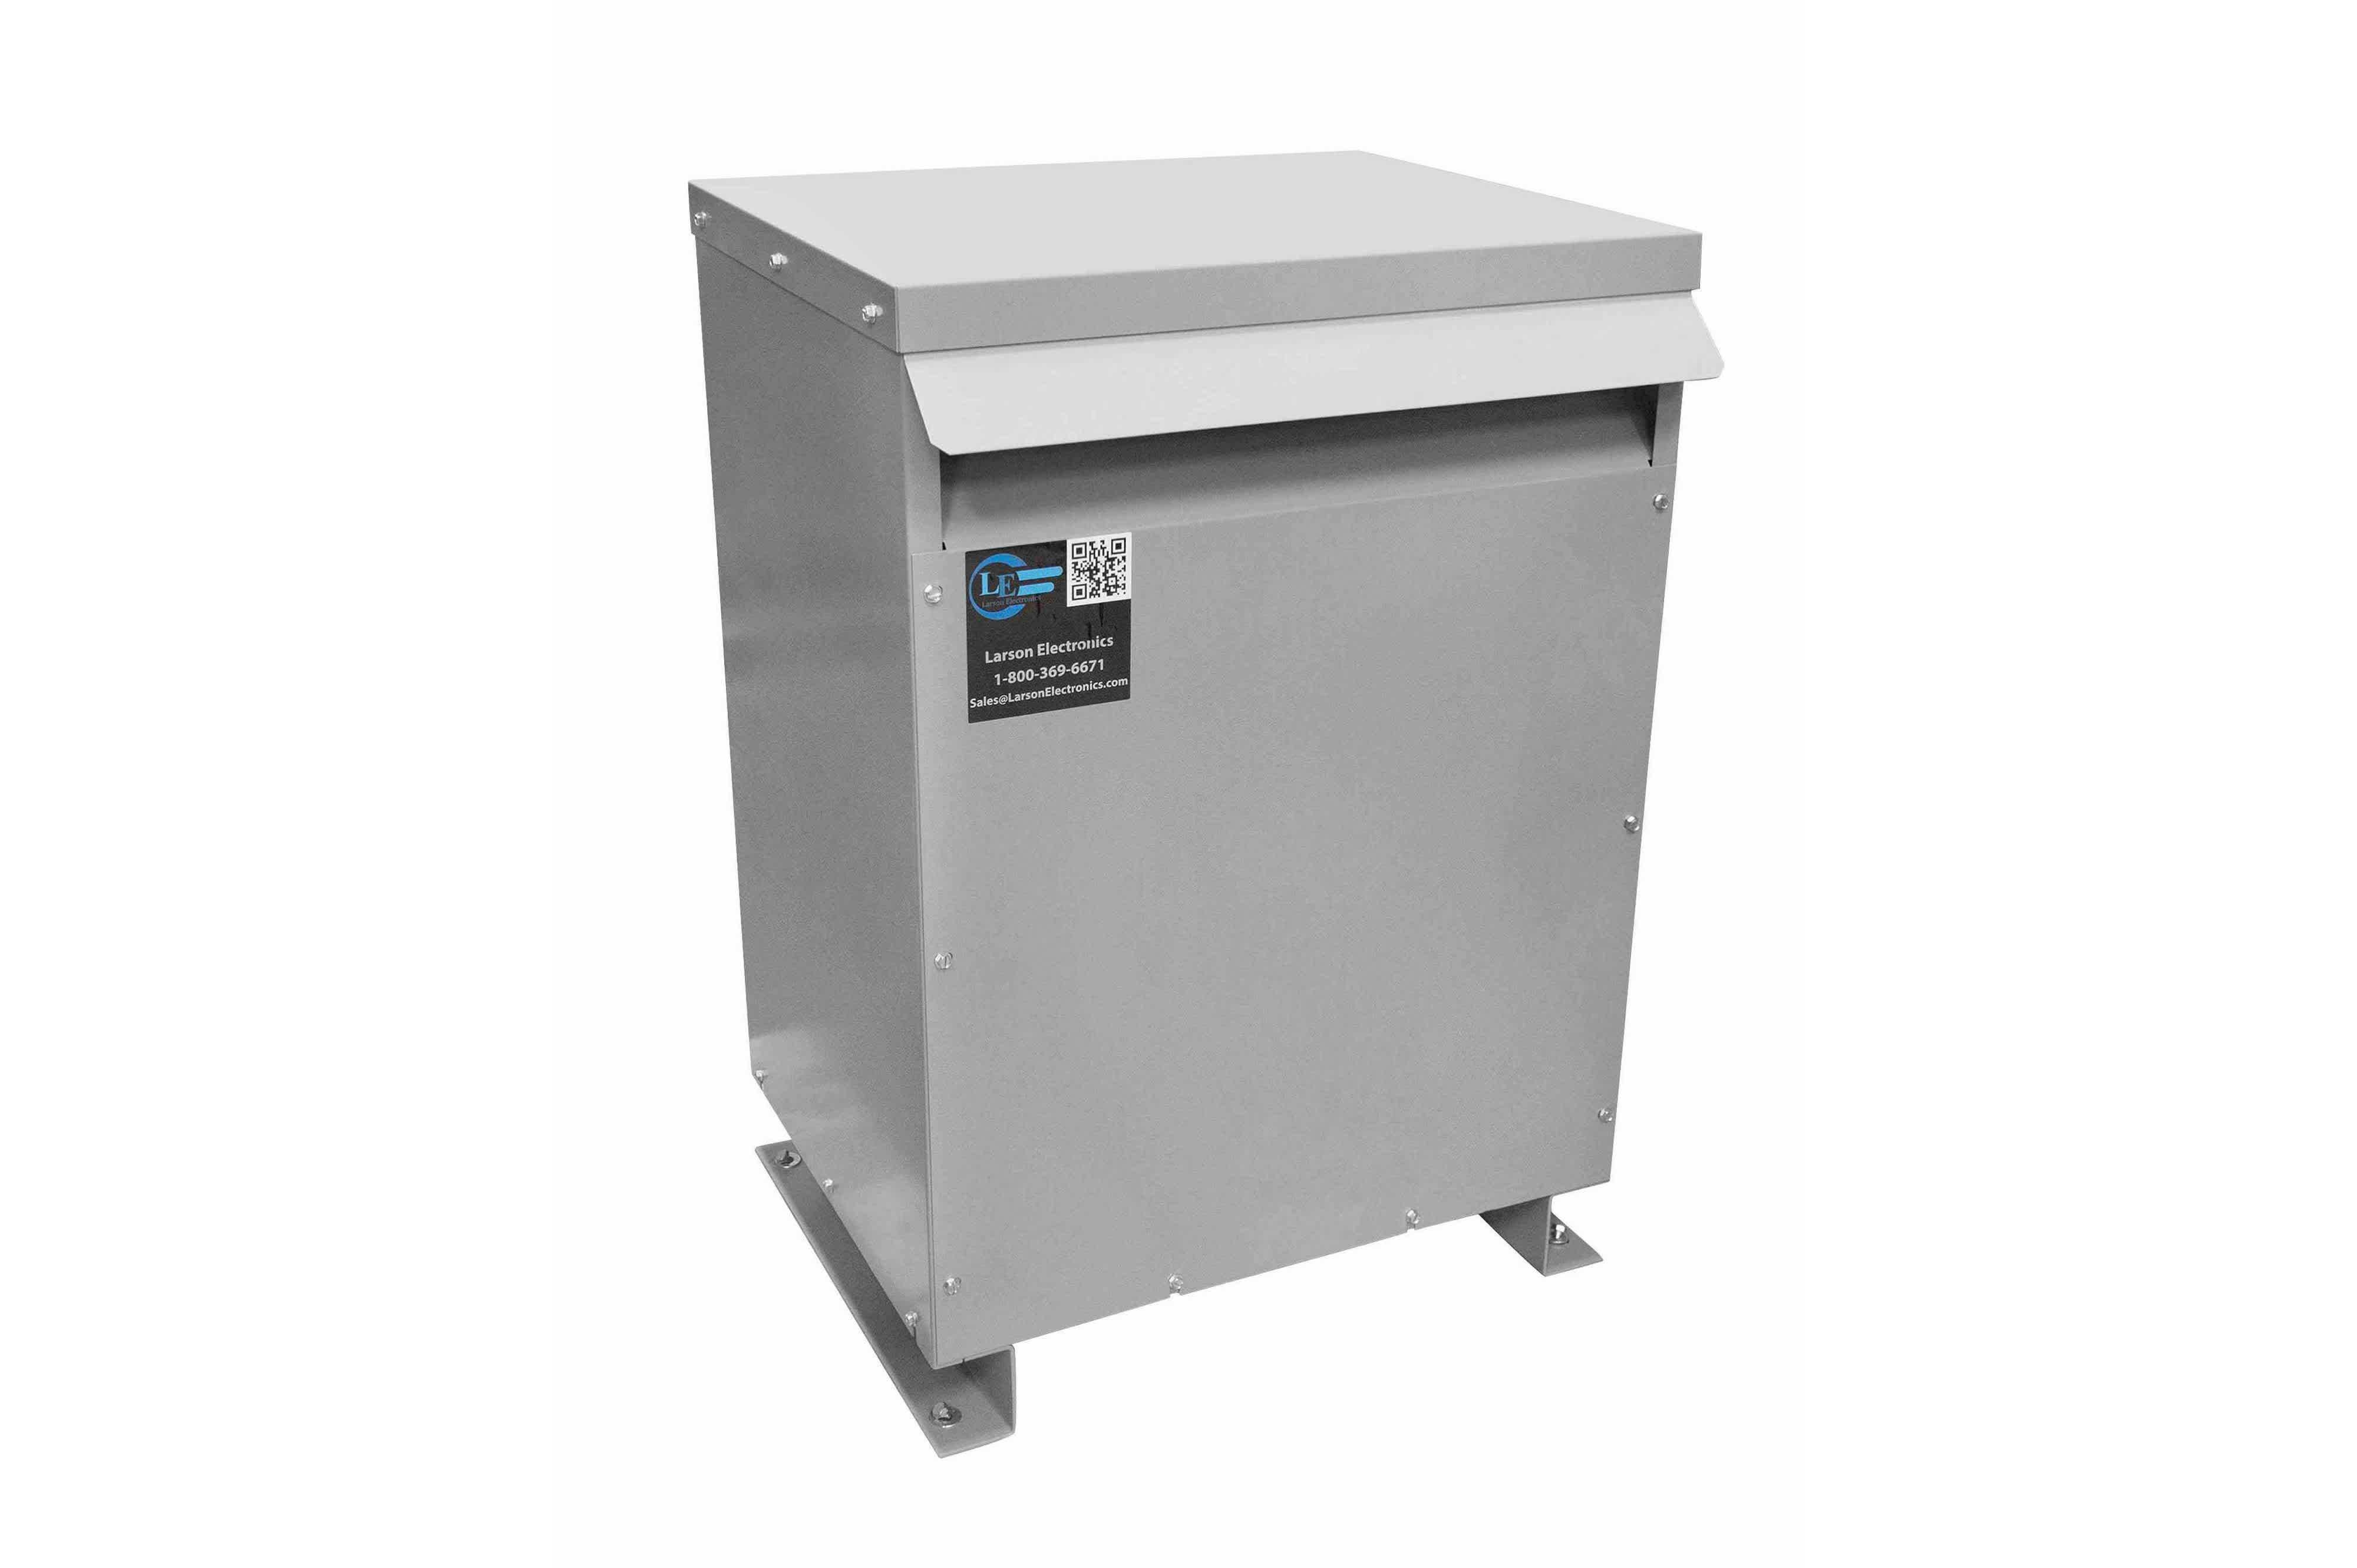 15 kVA 3PH Isolation Transformer, 208V Wye Primary, 480V Delta Secondary, N3R, Ventilated, 60 Hz